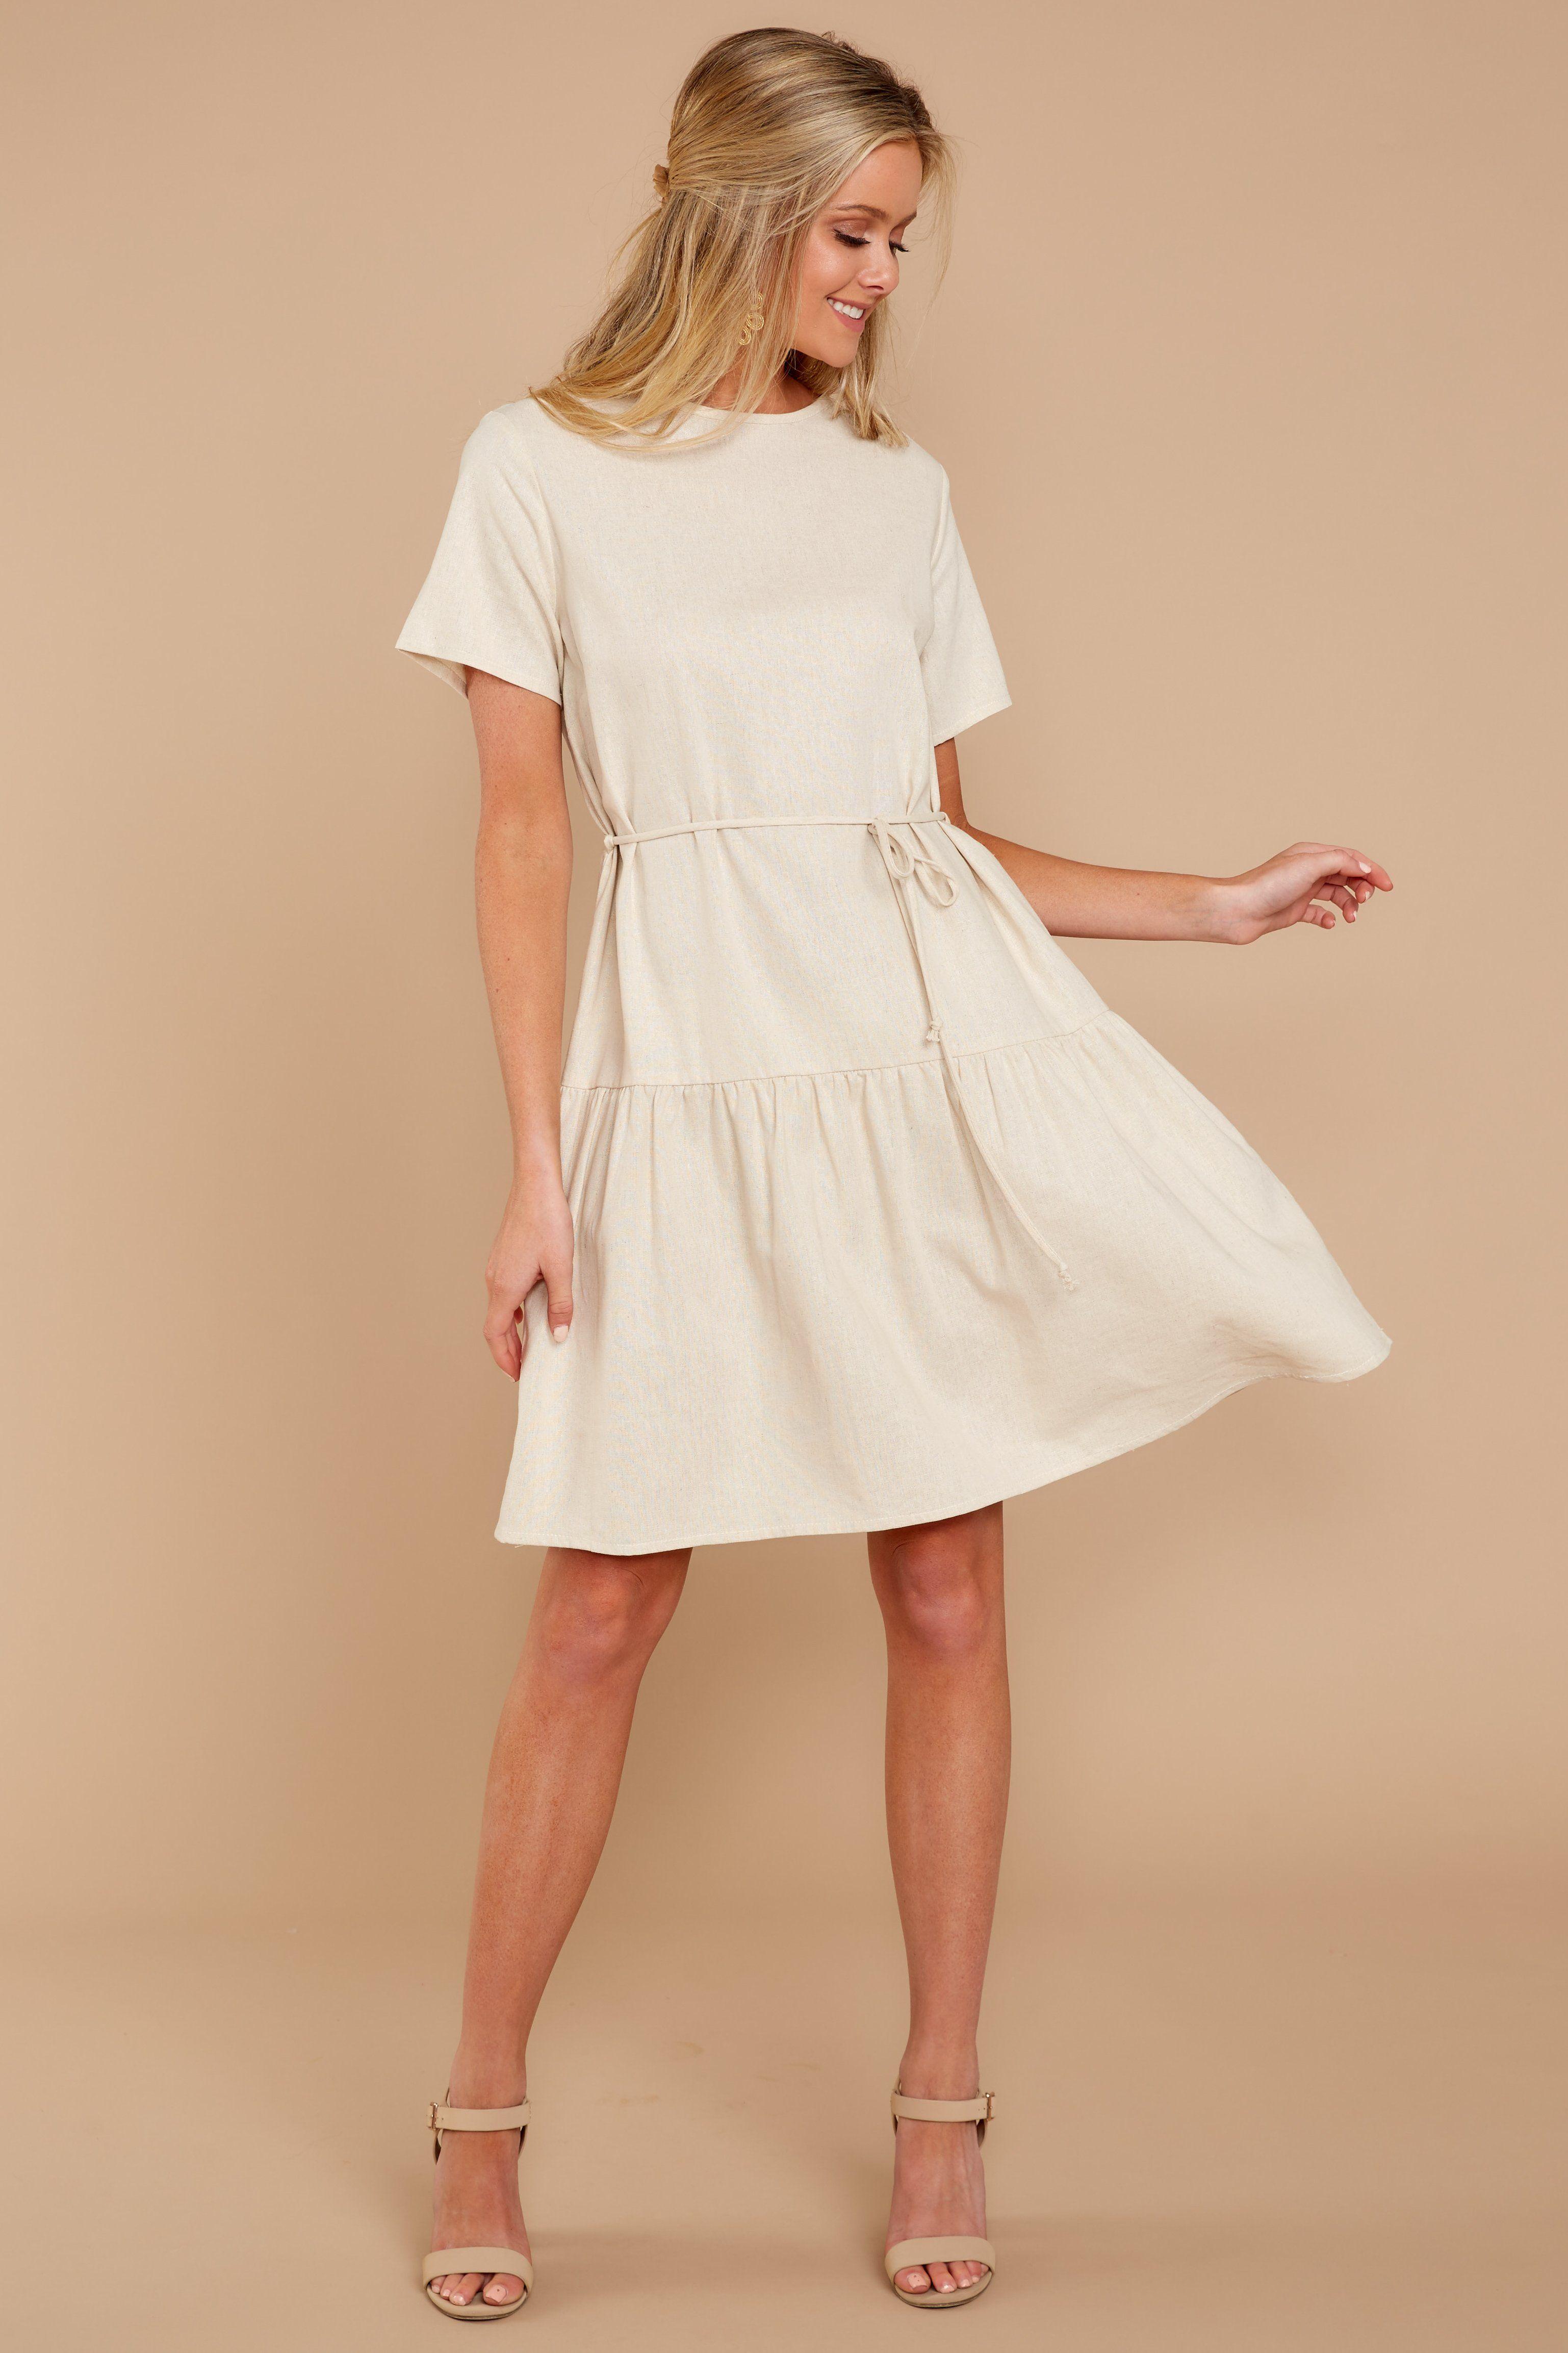 Cute beige dress short beige dress dress u red dress